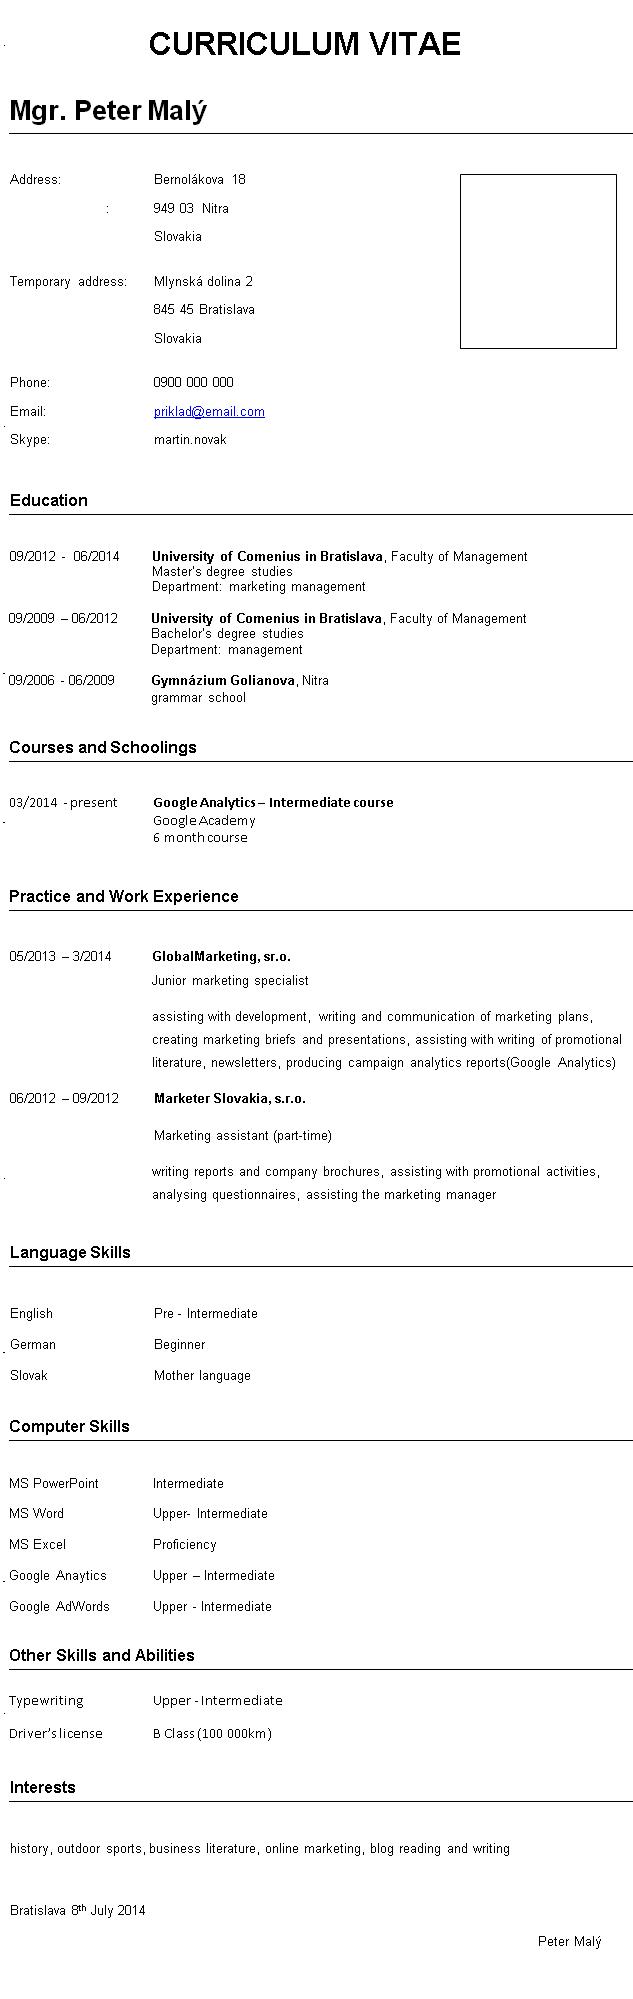 curriculum vitae vzor v anglictine